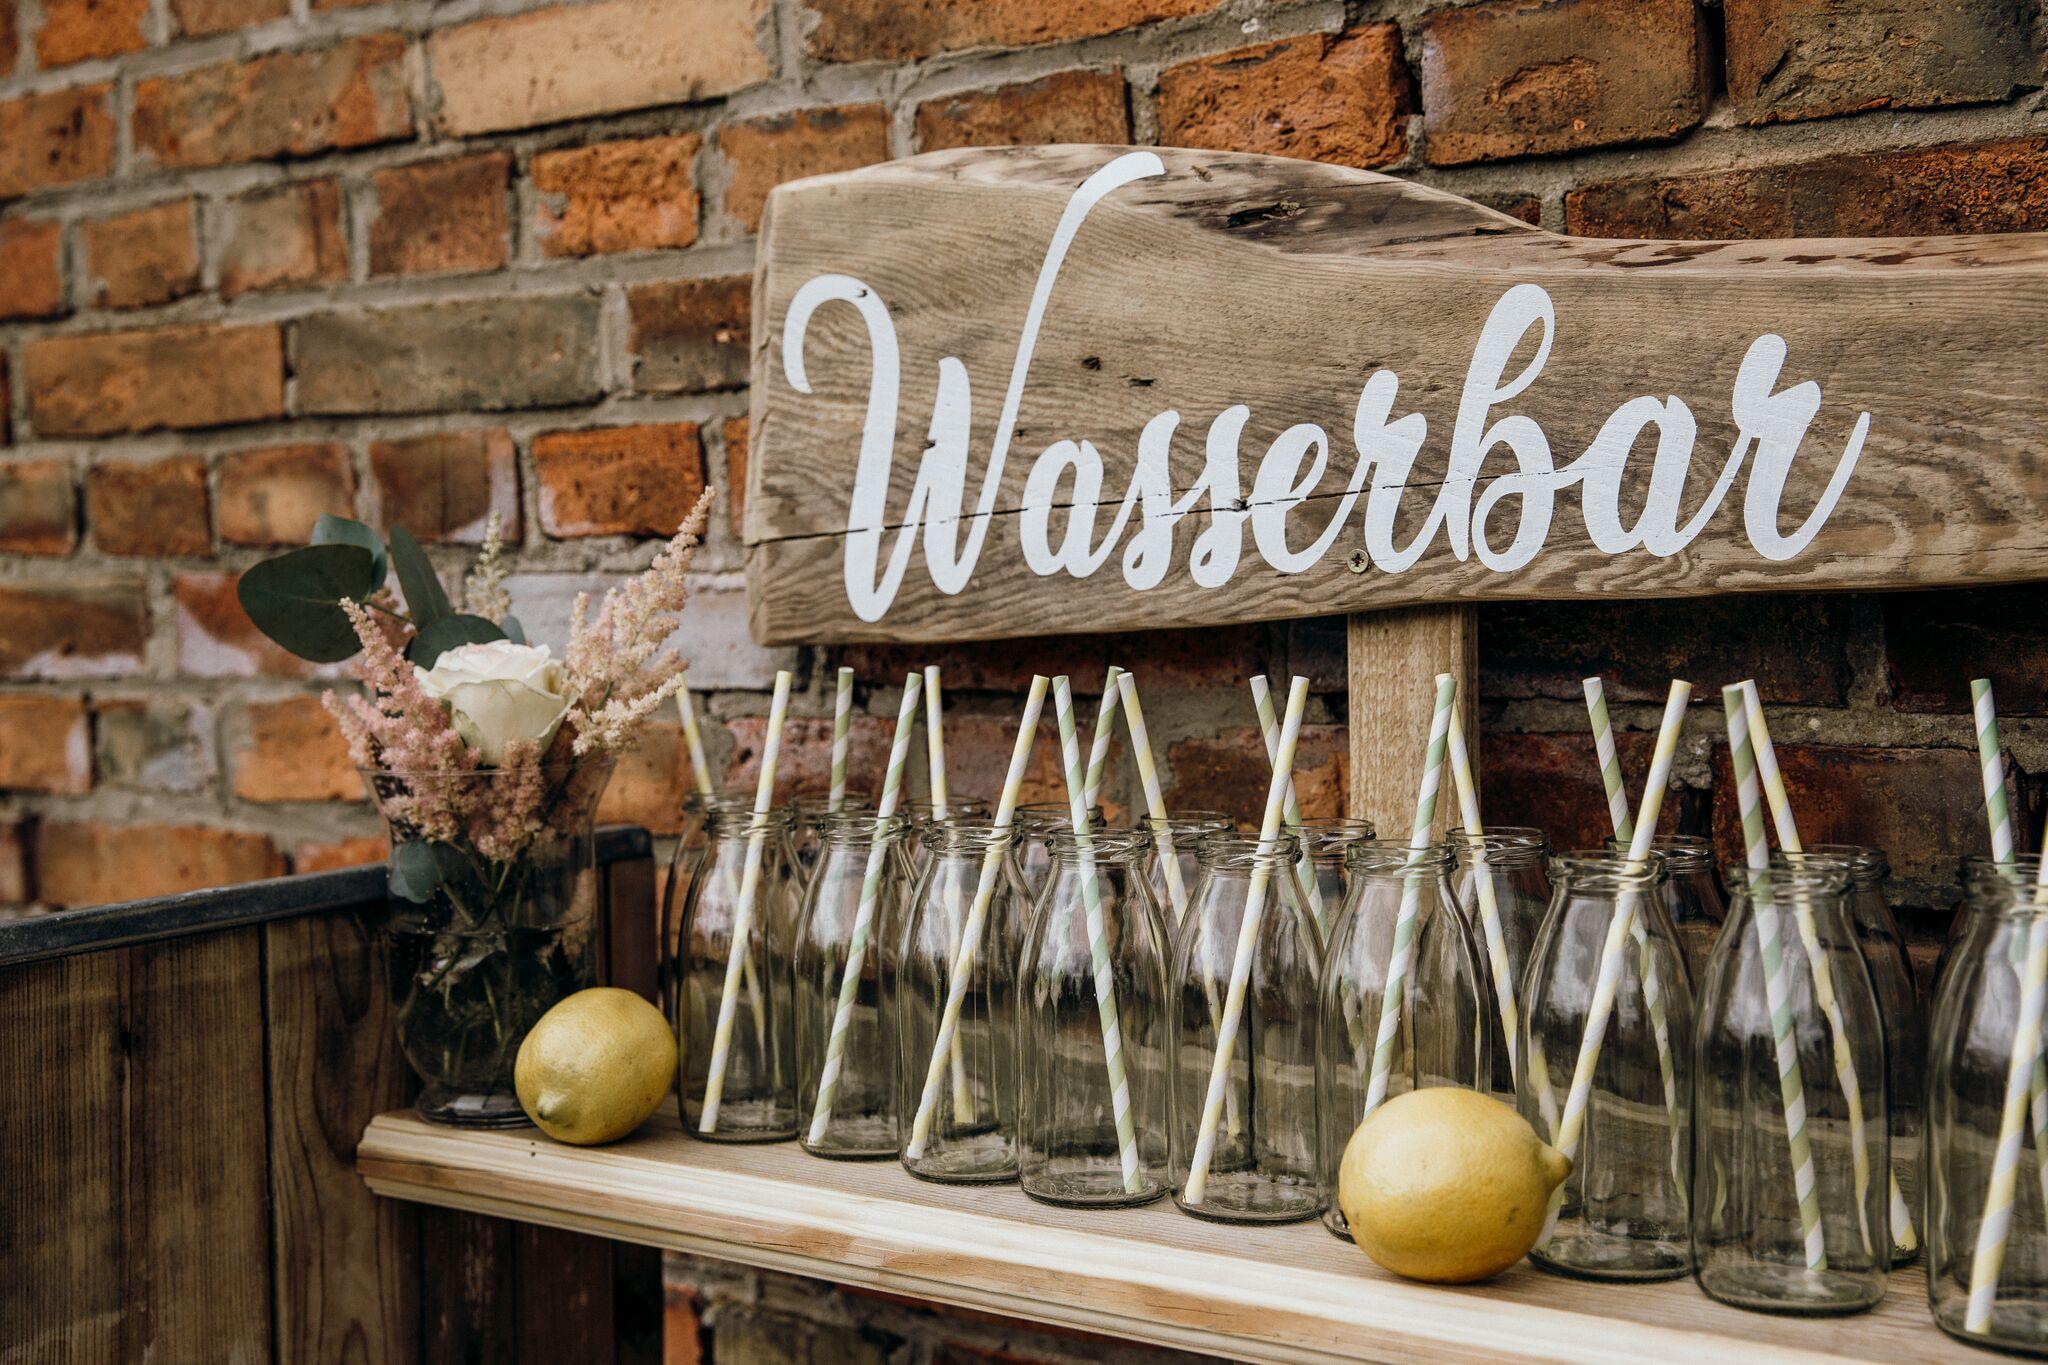 Wasserbar-Wedding.jpg